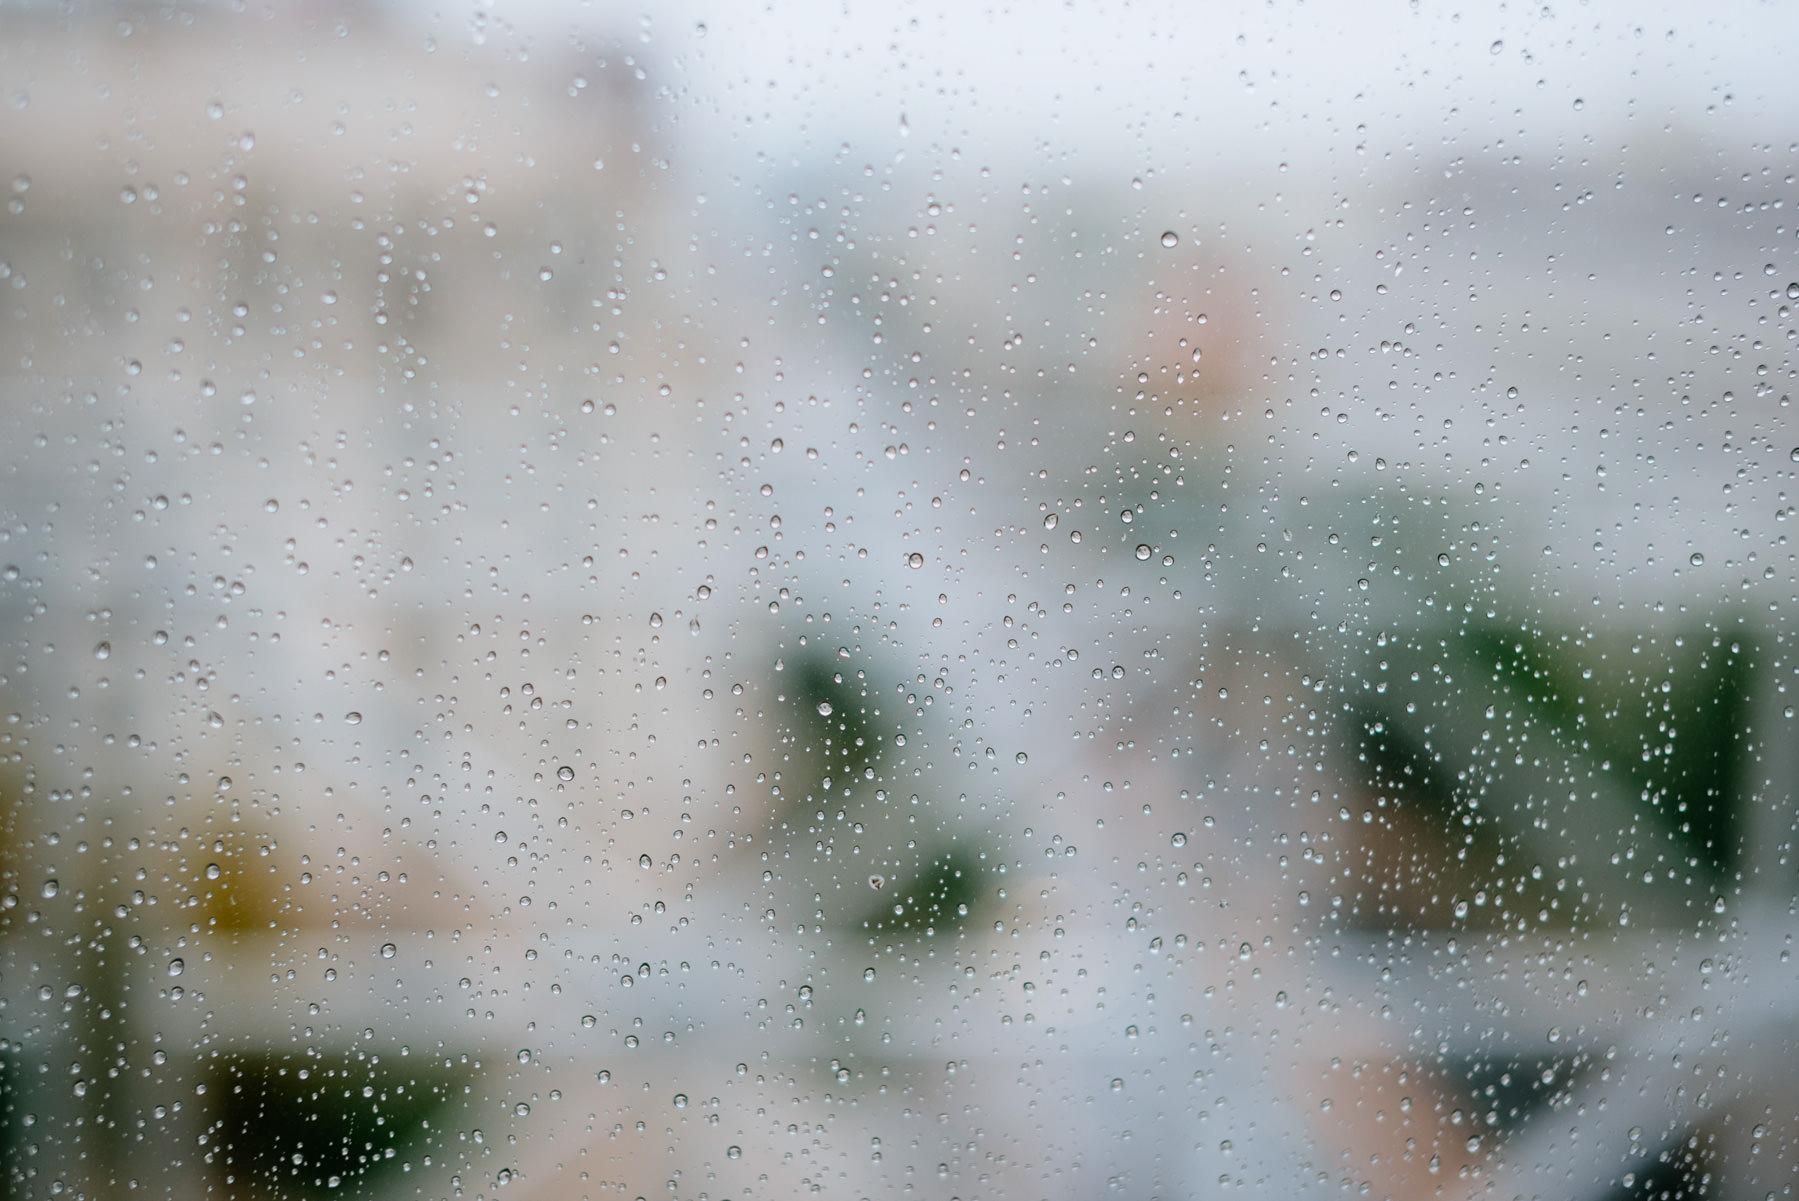 rain on a window pane